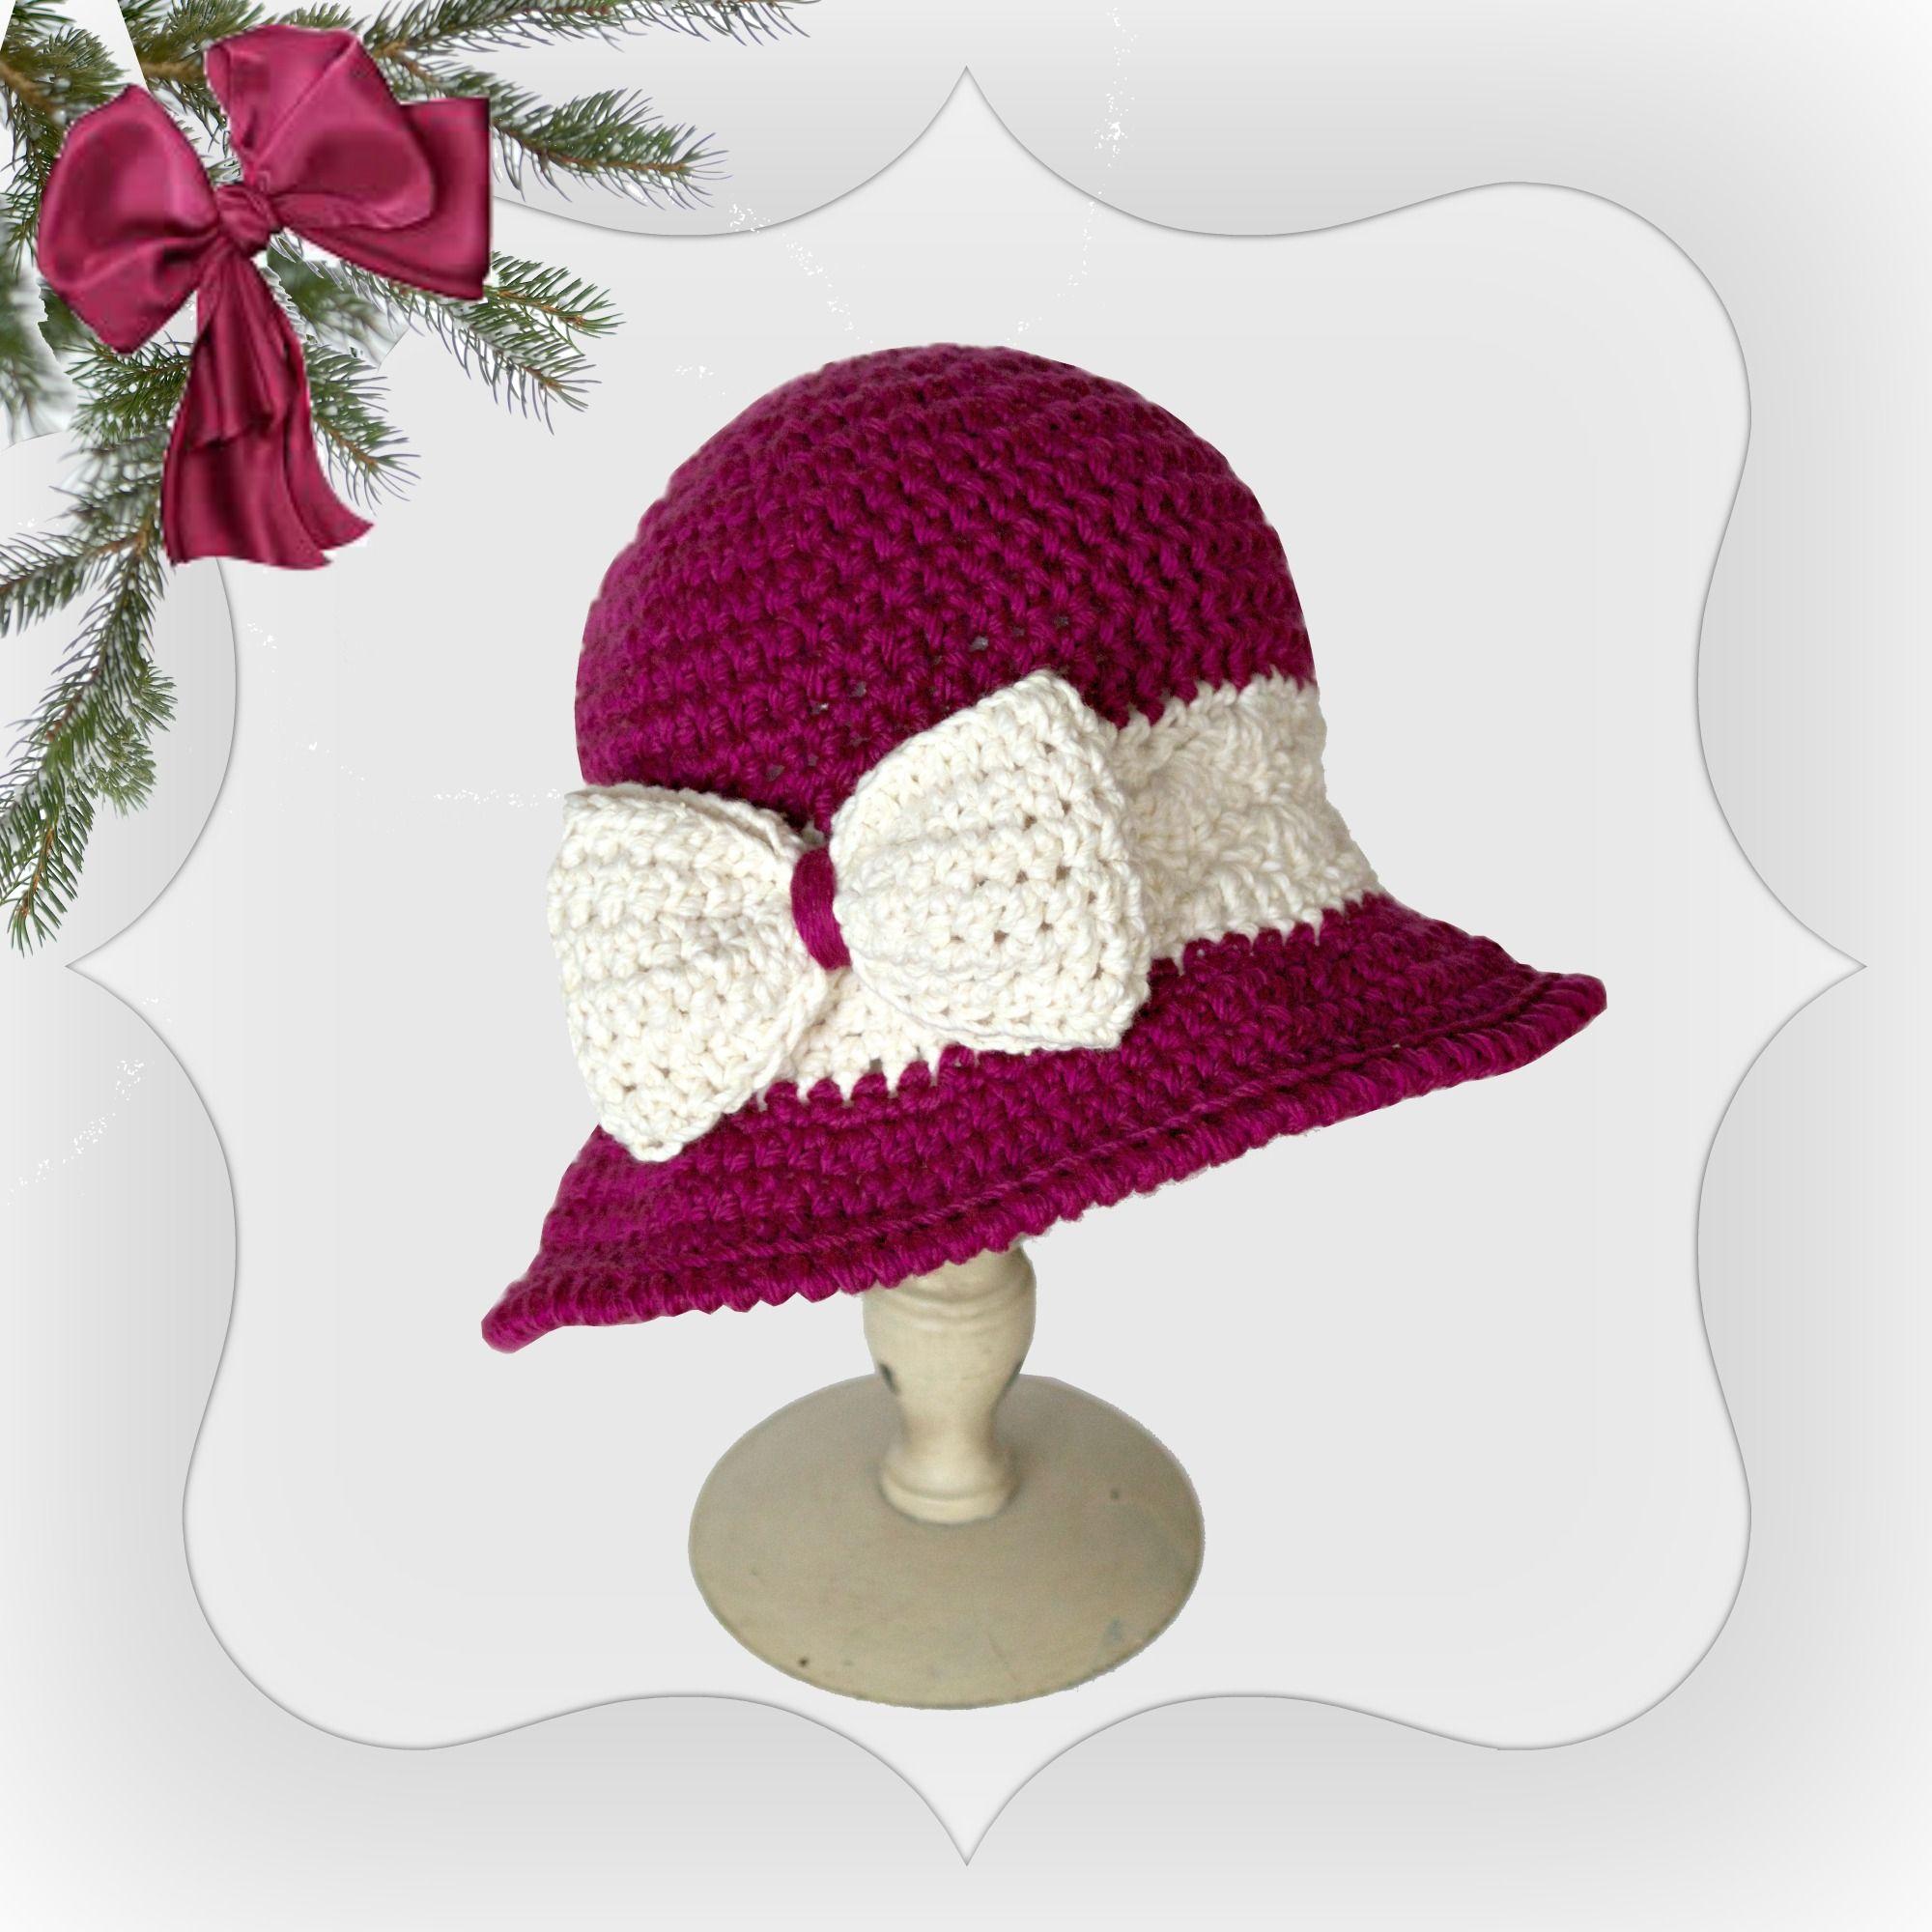 FREE Crochet Pattern - Holiday Joy | Gorros, Gorros crochet y Trajes ...